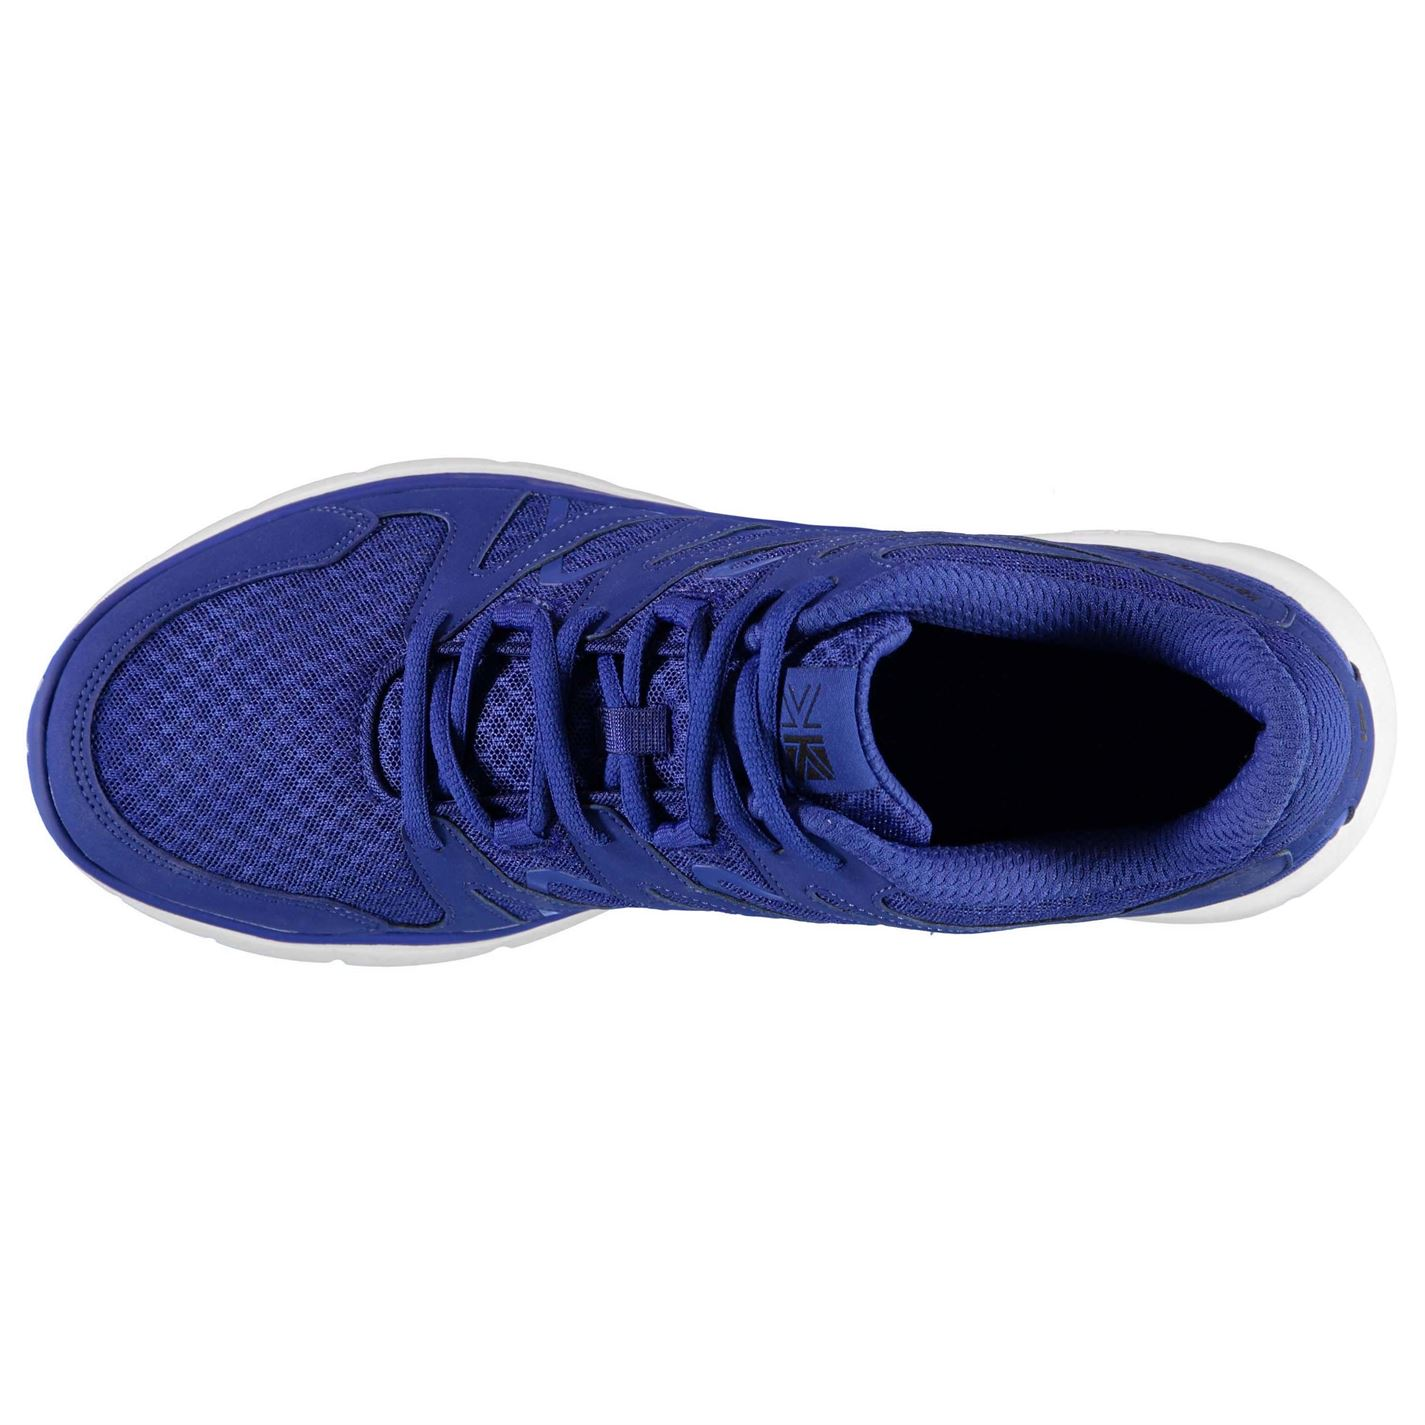 Karrimor-Mens-Duma-Trainers-Lace-Up-Sports-Running-Cross-Training-Shoes thumbnail 42